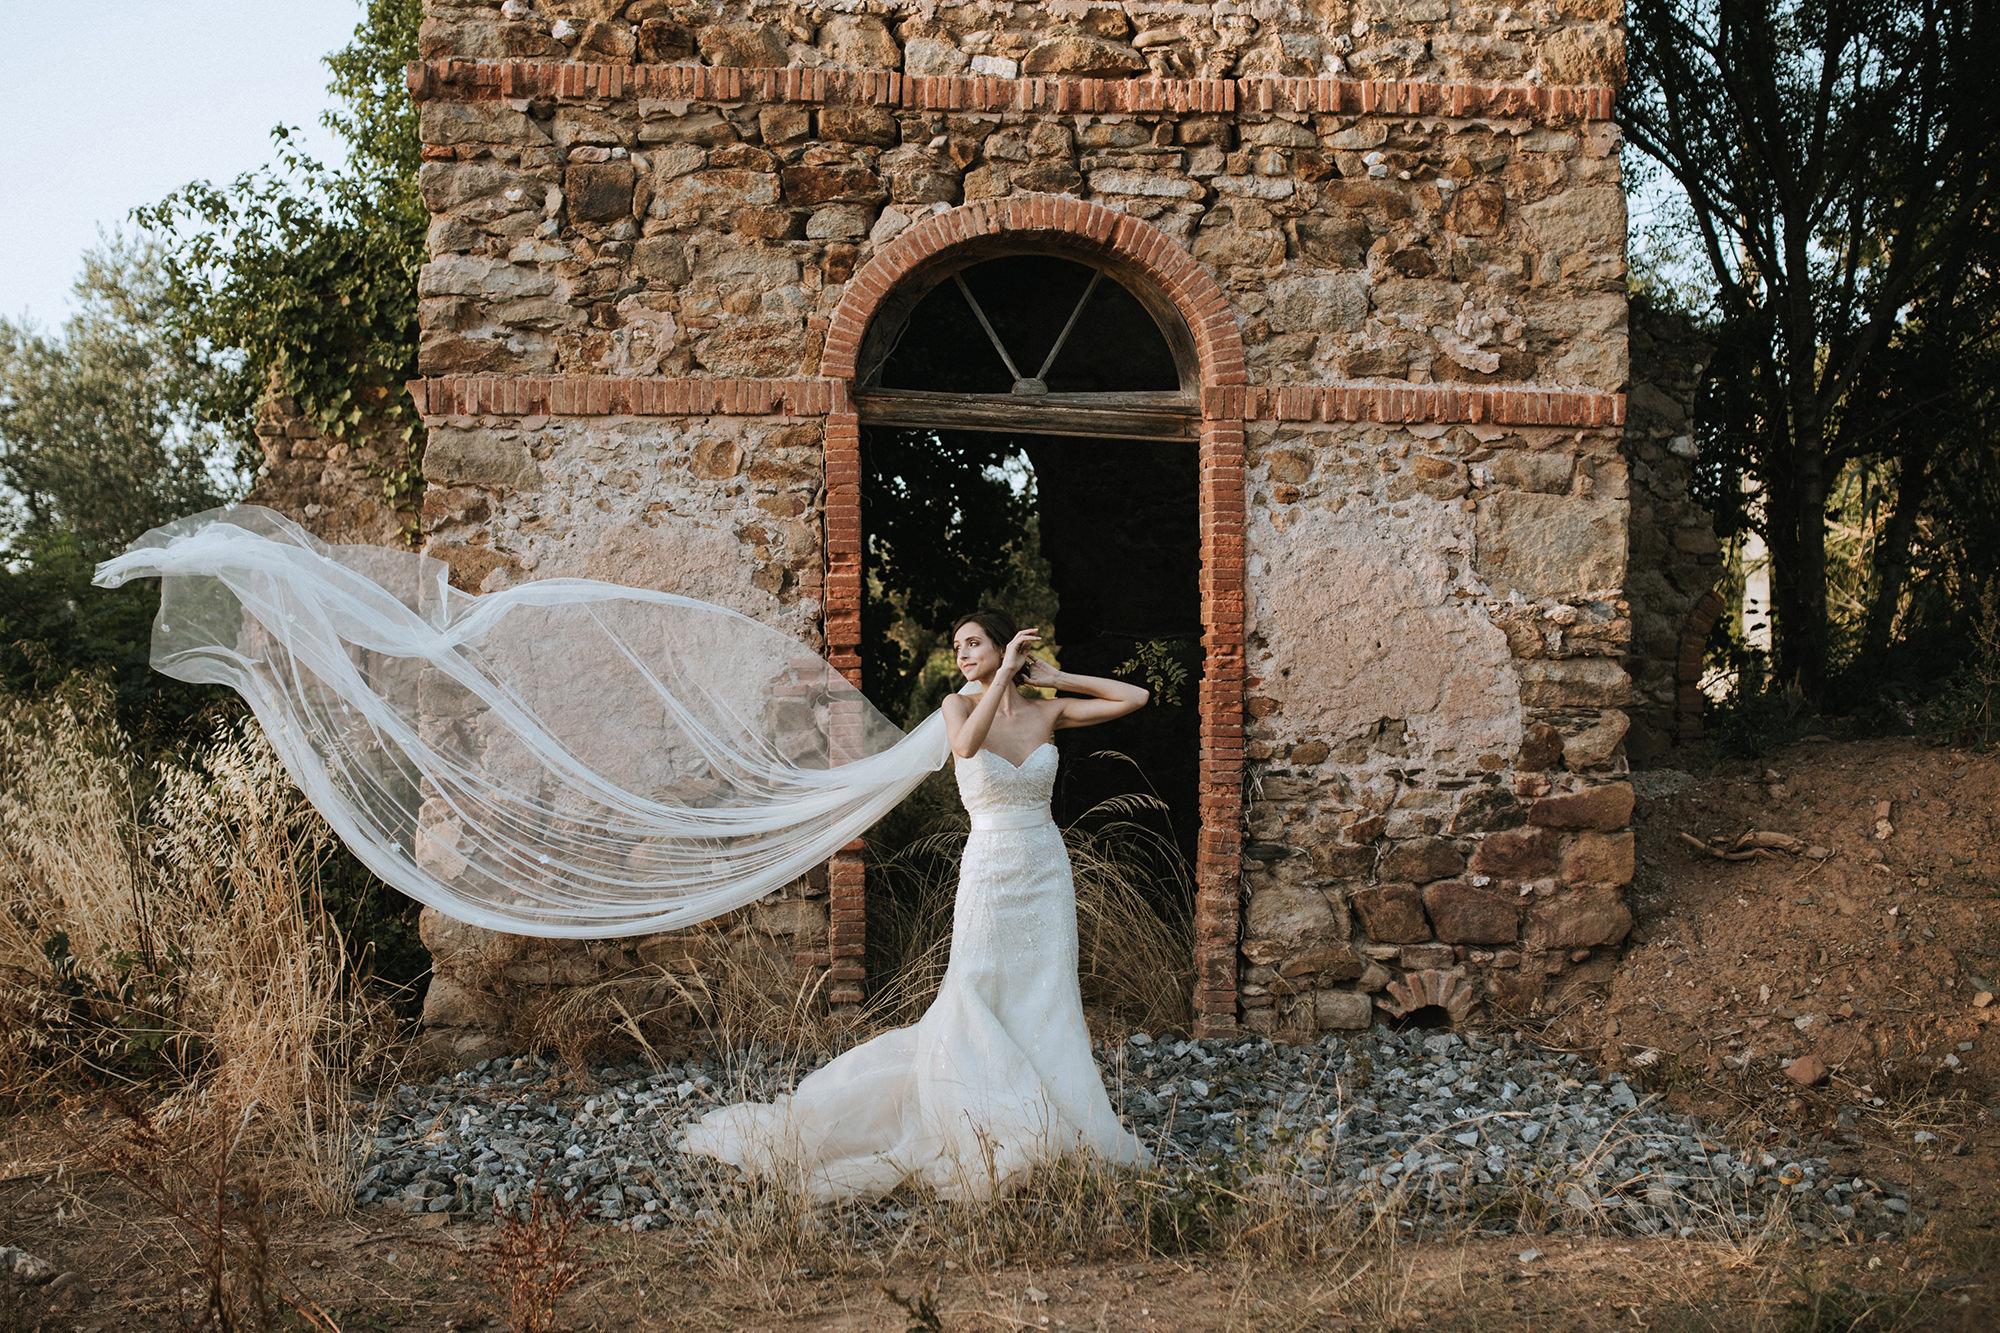 wedding_magnanerie_st_isidore_hyeres_Julie+Francois_neupaphotography-668.jpg